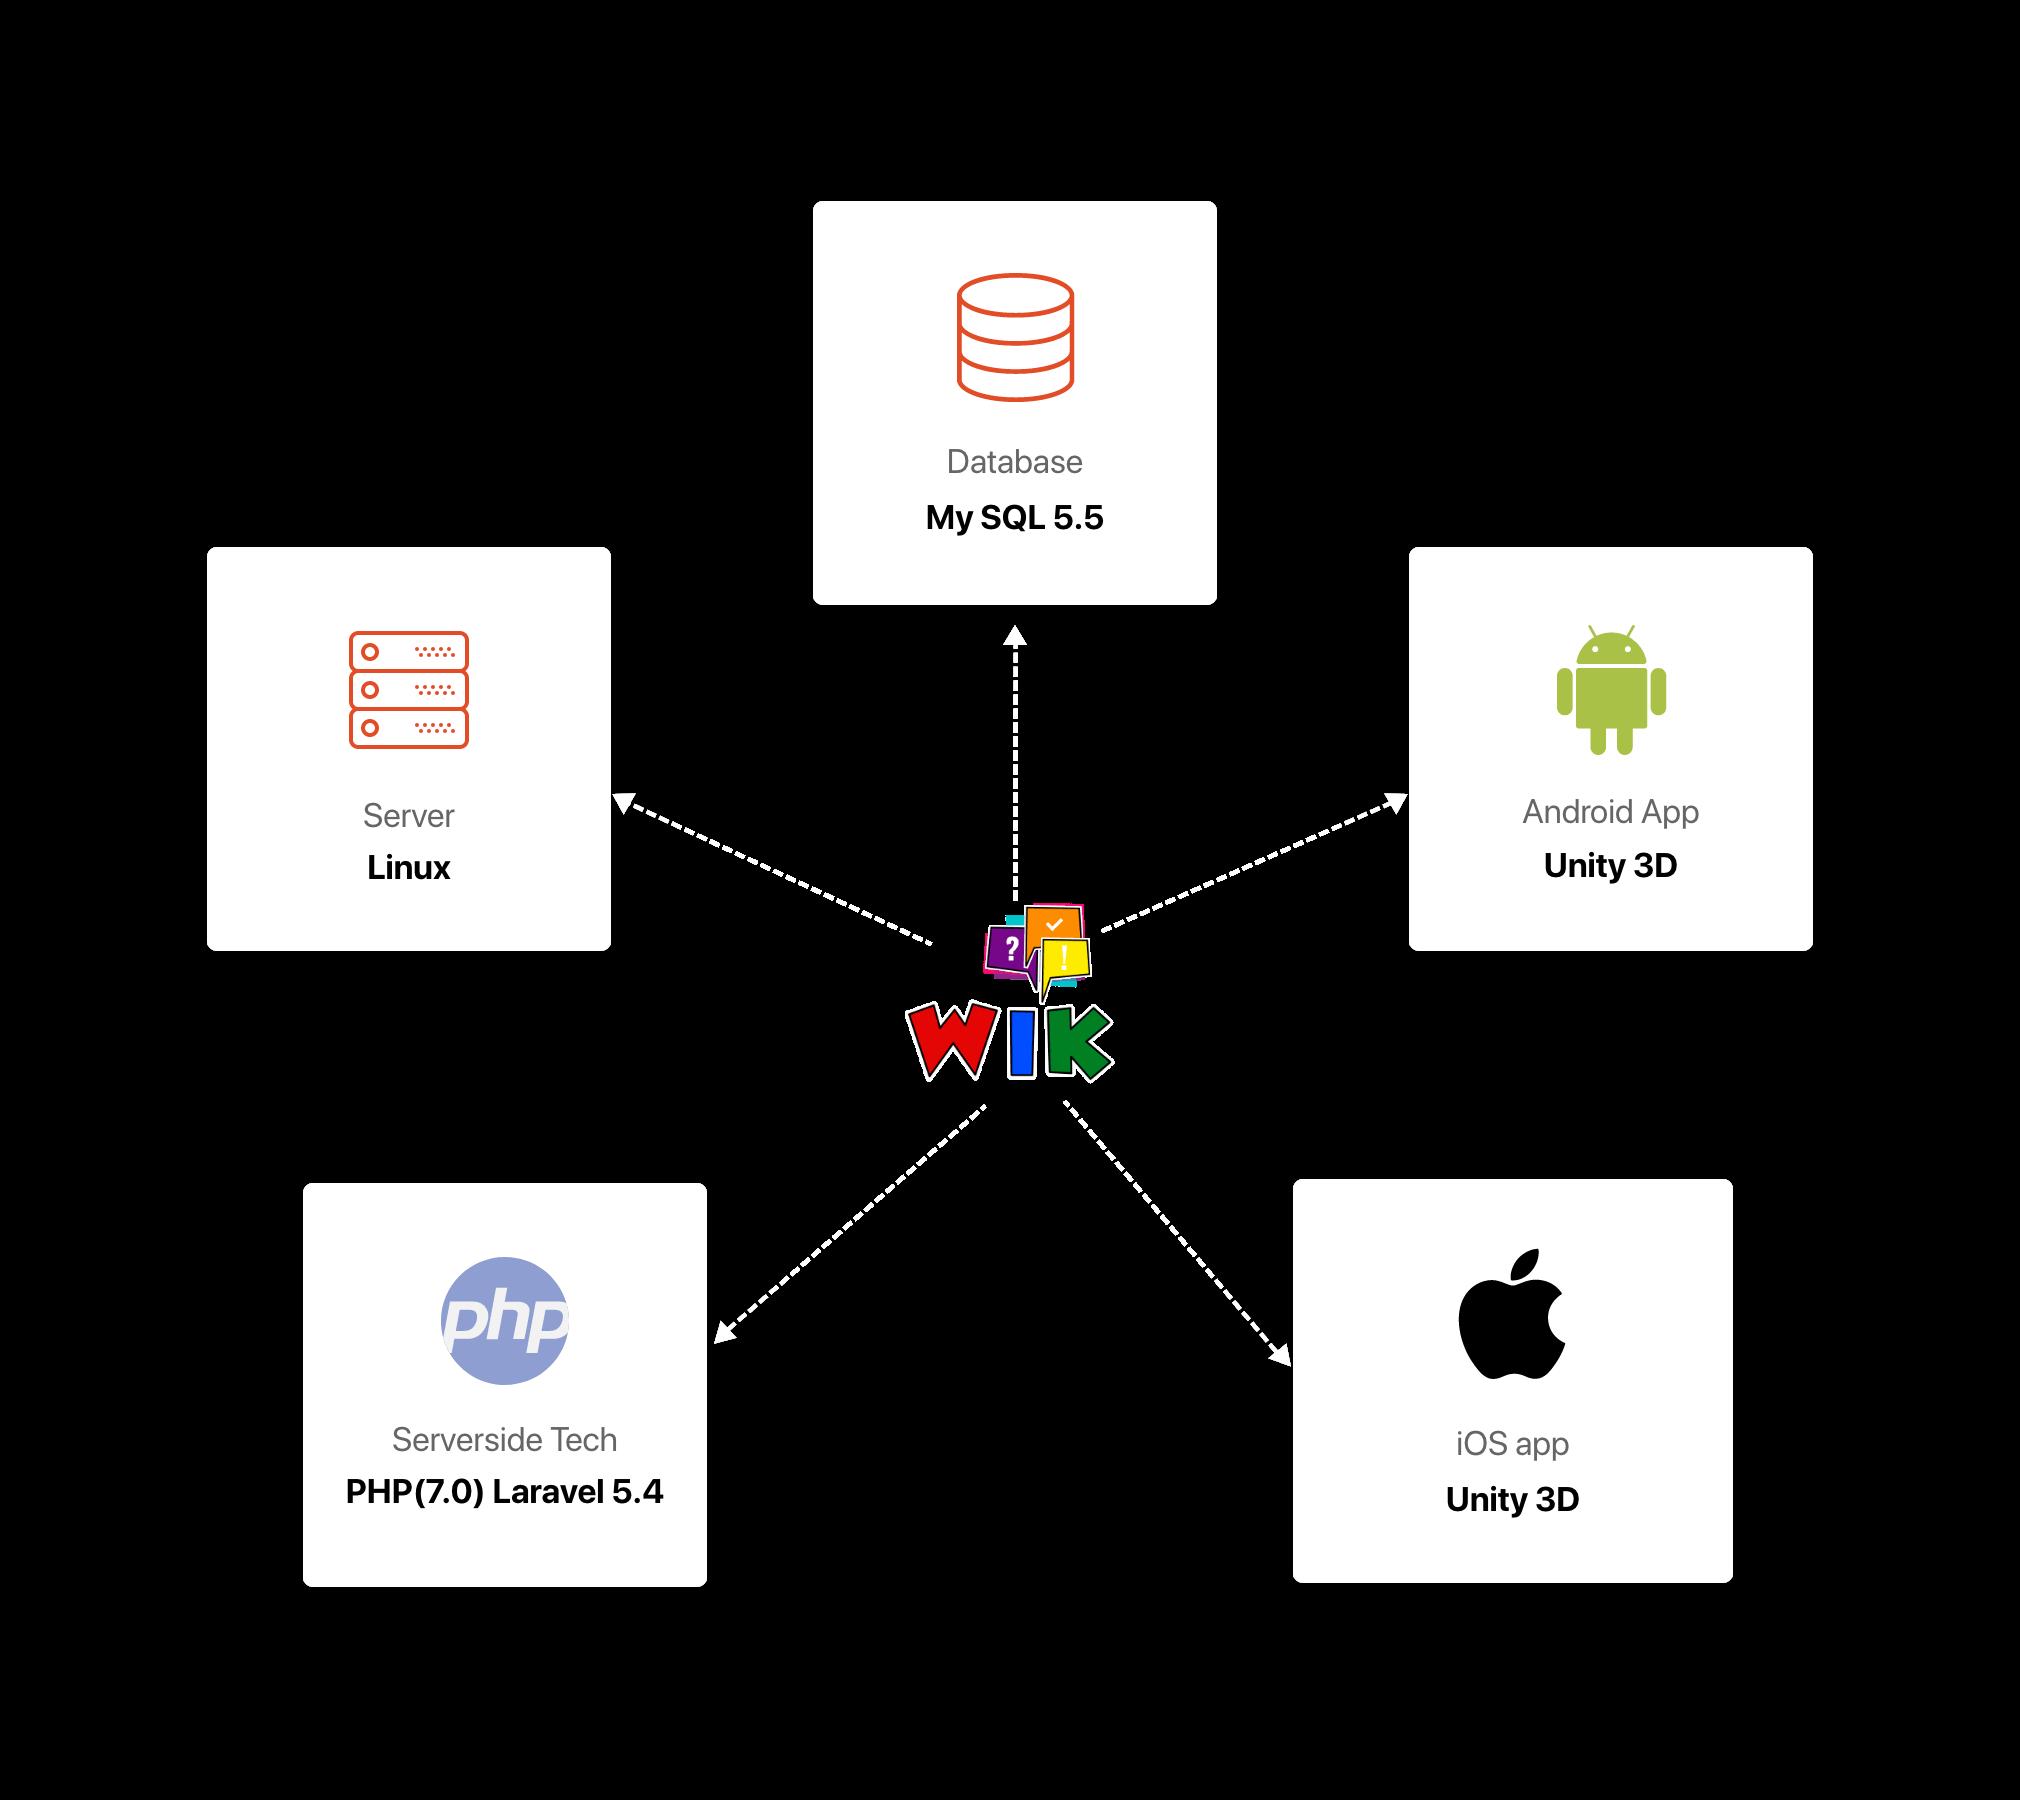 WIK Technology Stack